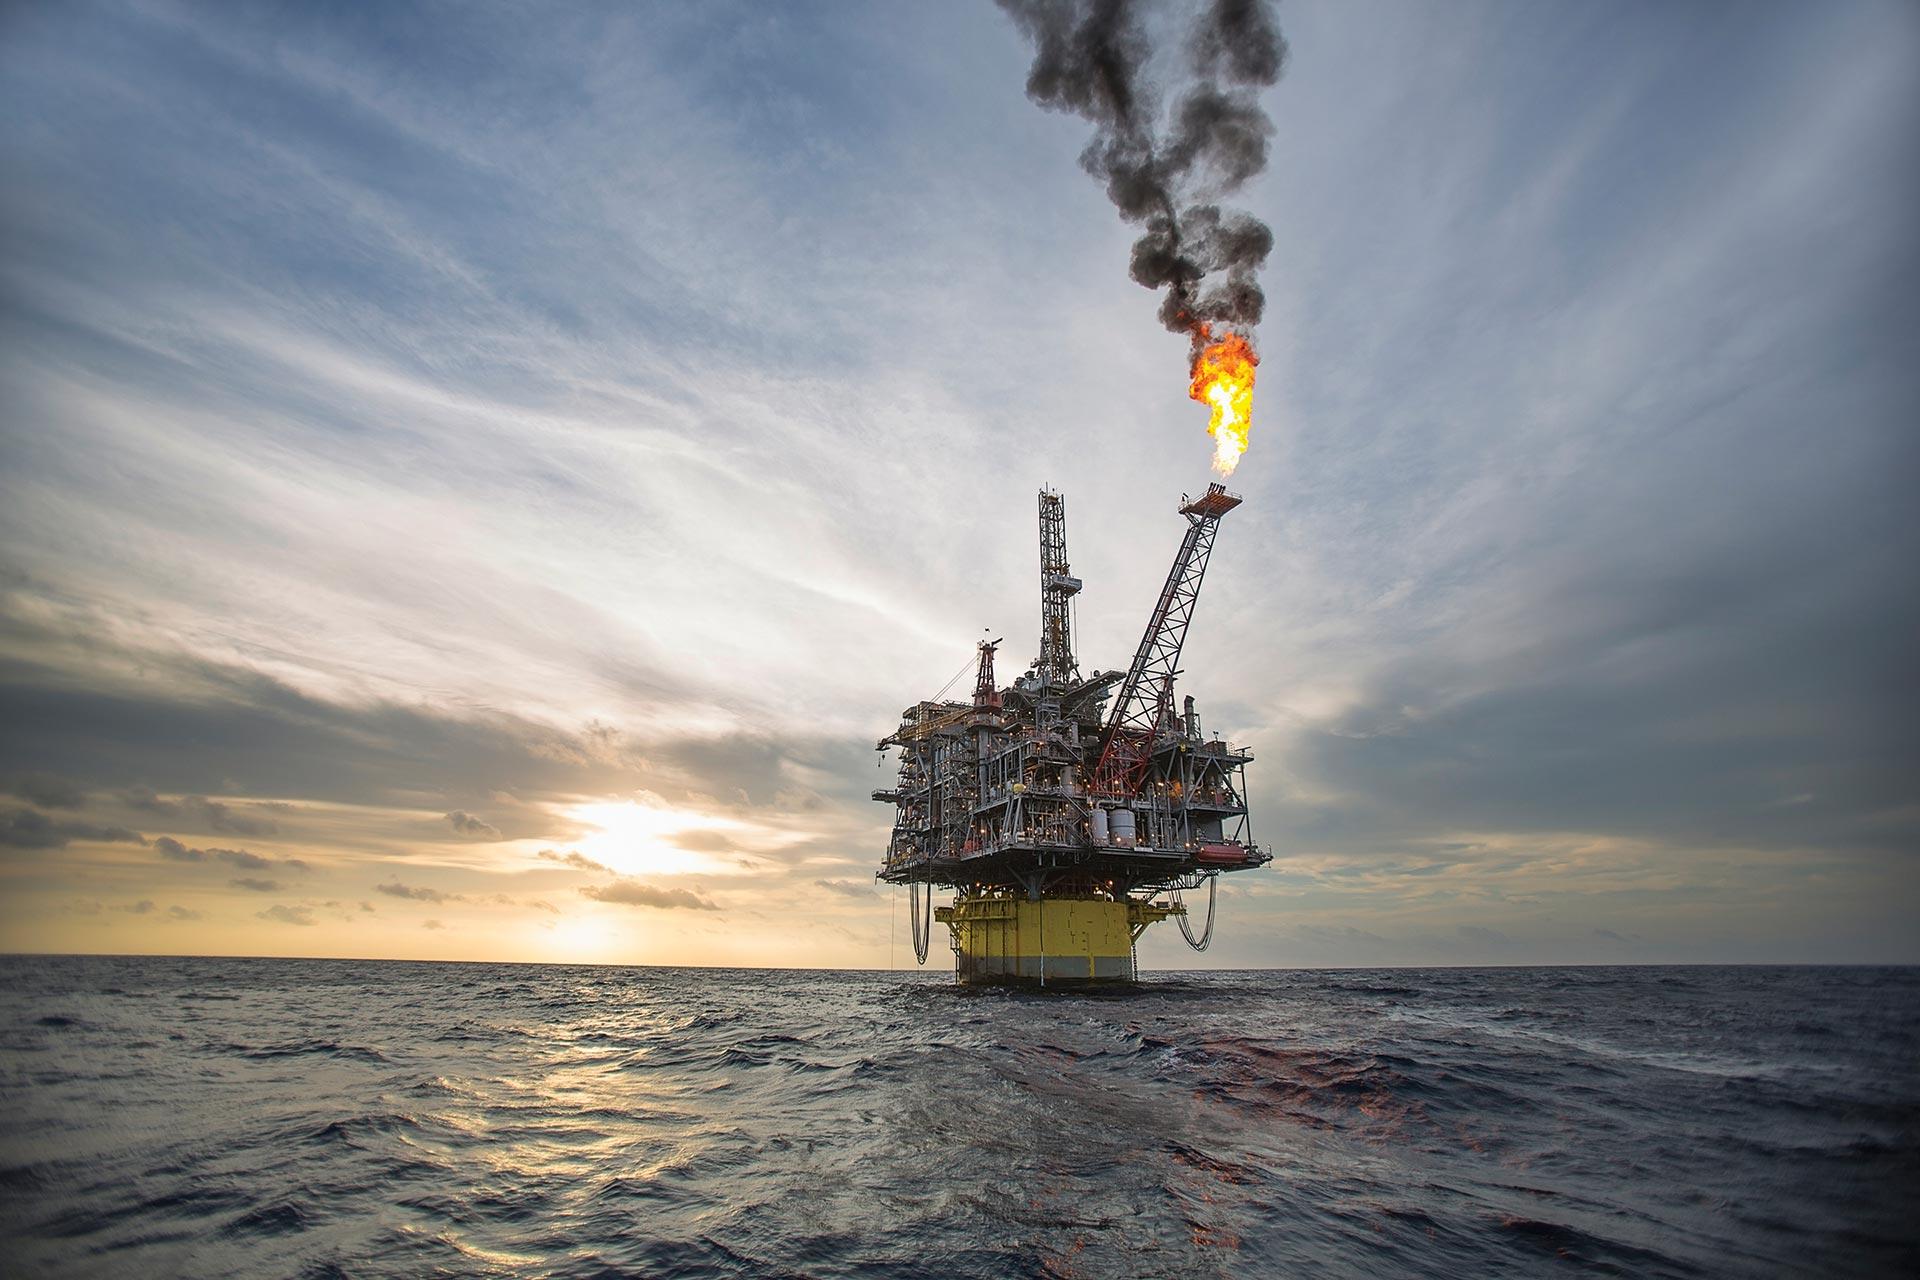 Natural gas platform